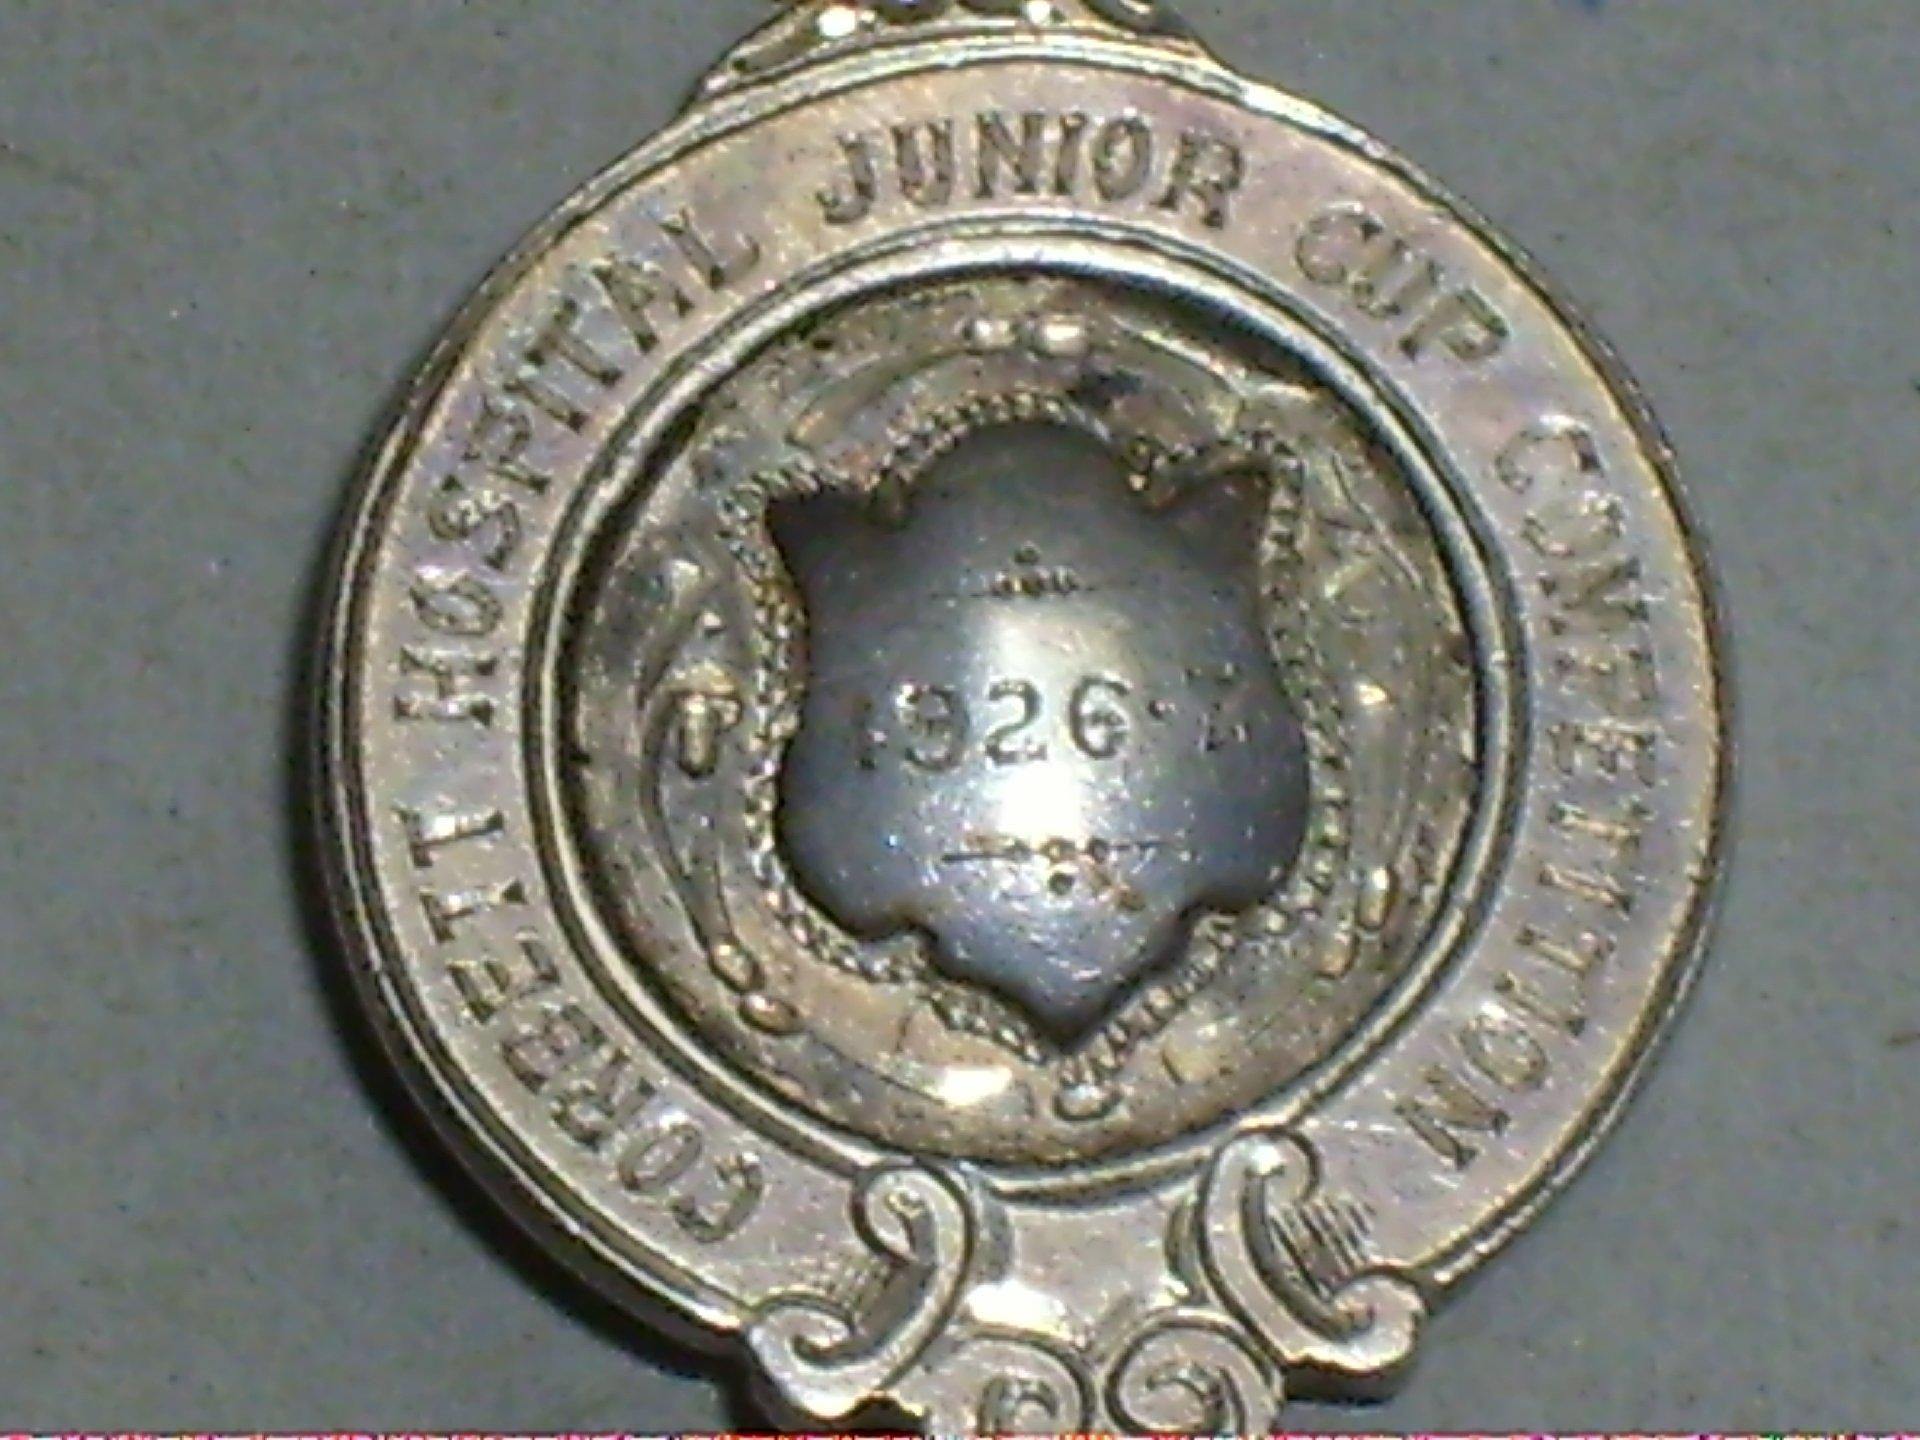 2007 001 030